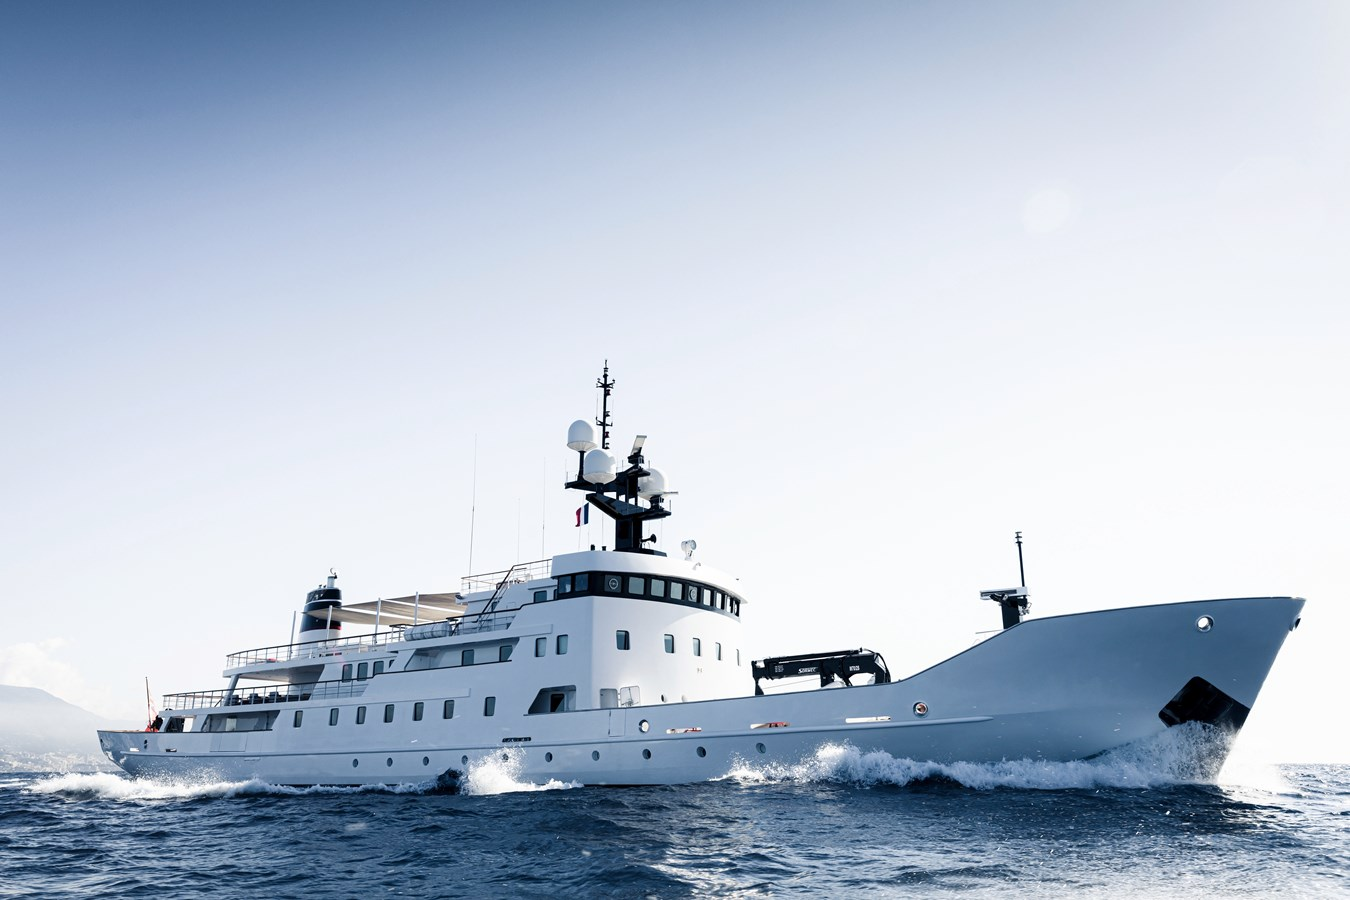 OLIVIA_00004897_vb1514779 1972 OY LAIVATEOLLISUUS  Mega Yacht 2726254